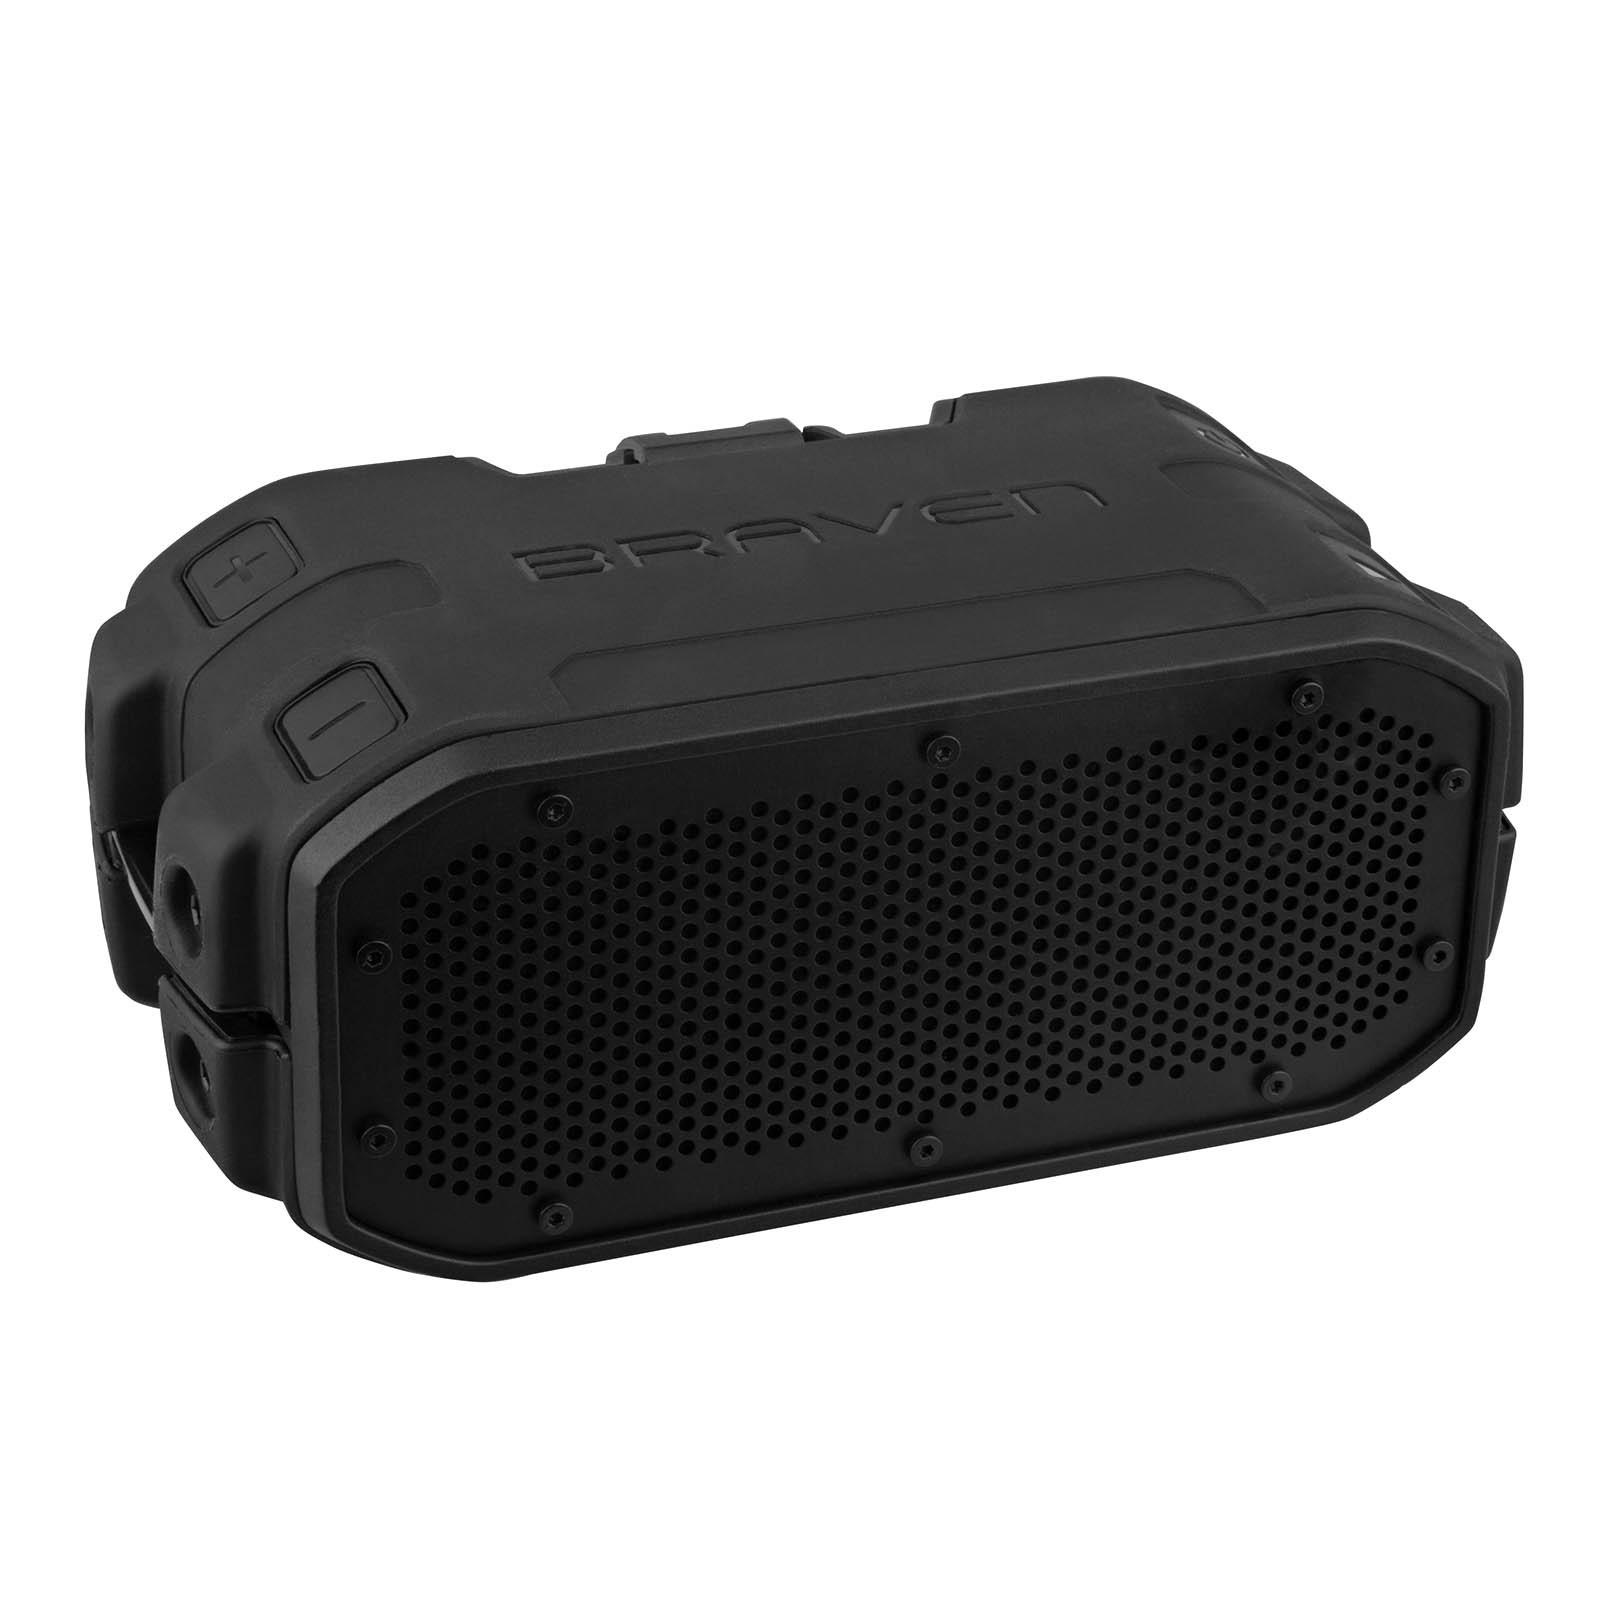 Braven BRV-1M  Bluetooth speakers refurbished $19.95 for two (must buy 2) Techrabbit FS